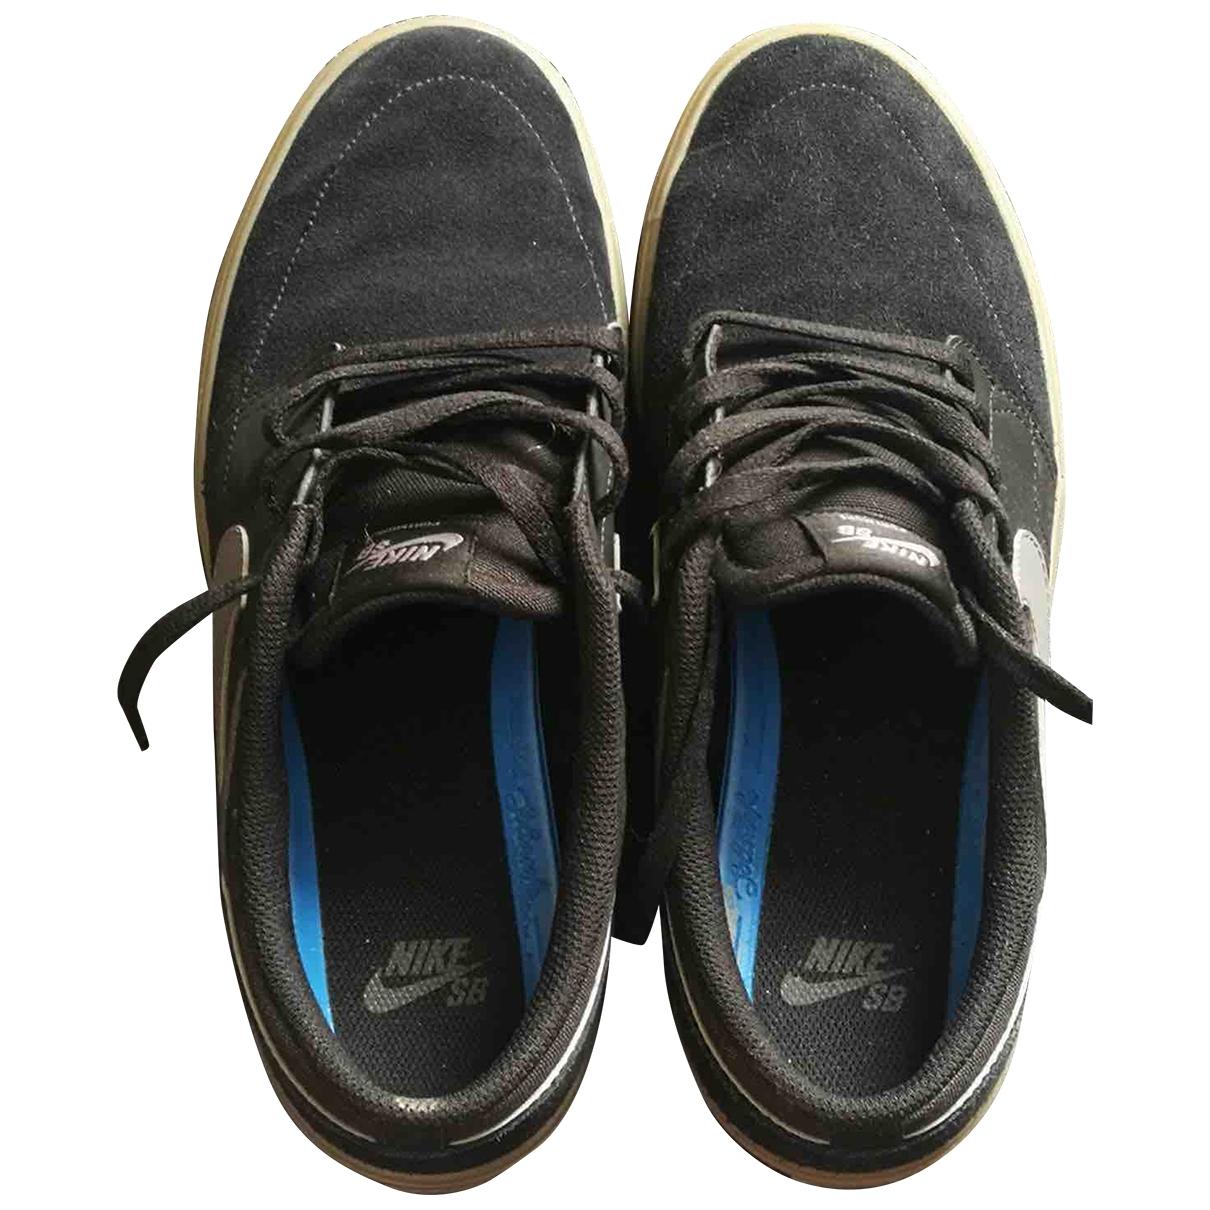 Nike \N Black Suede Trainers for Men 42.5 EU